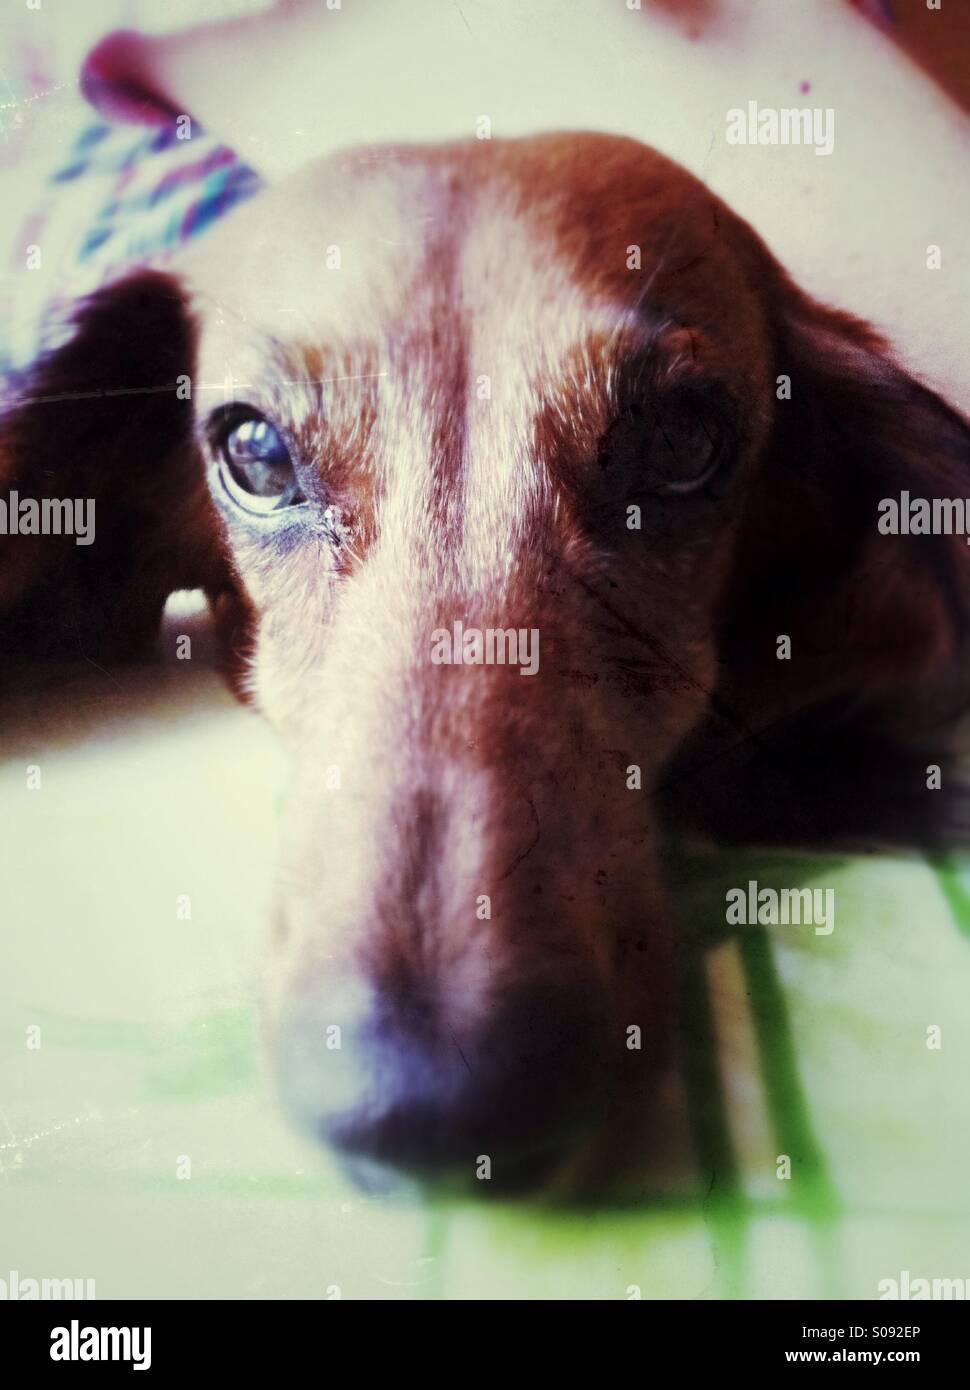 Niedlichen Hund portrait Stockbild